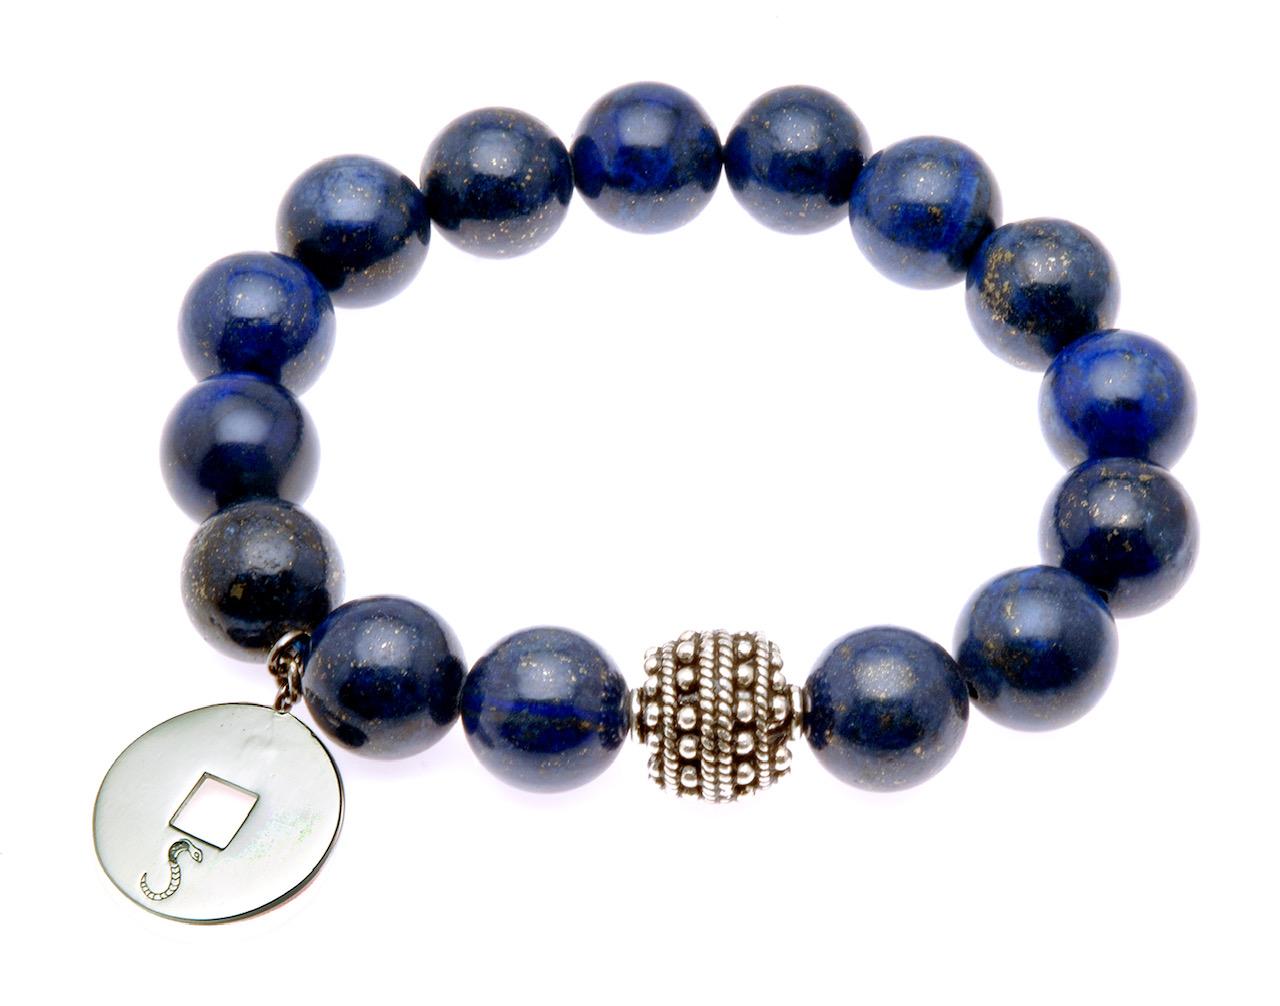 Water_bracelet_6898_v2_4x5.jpg